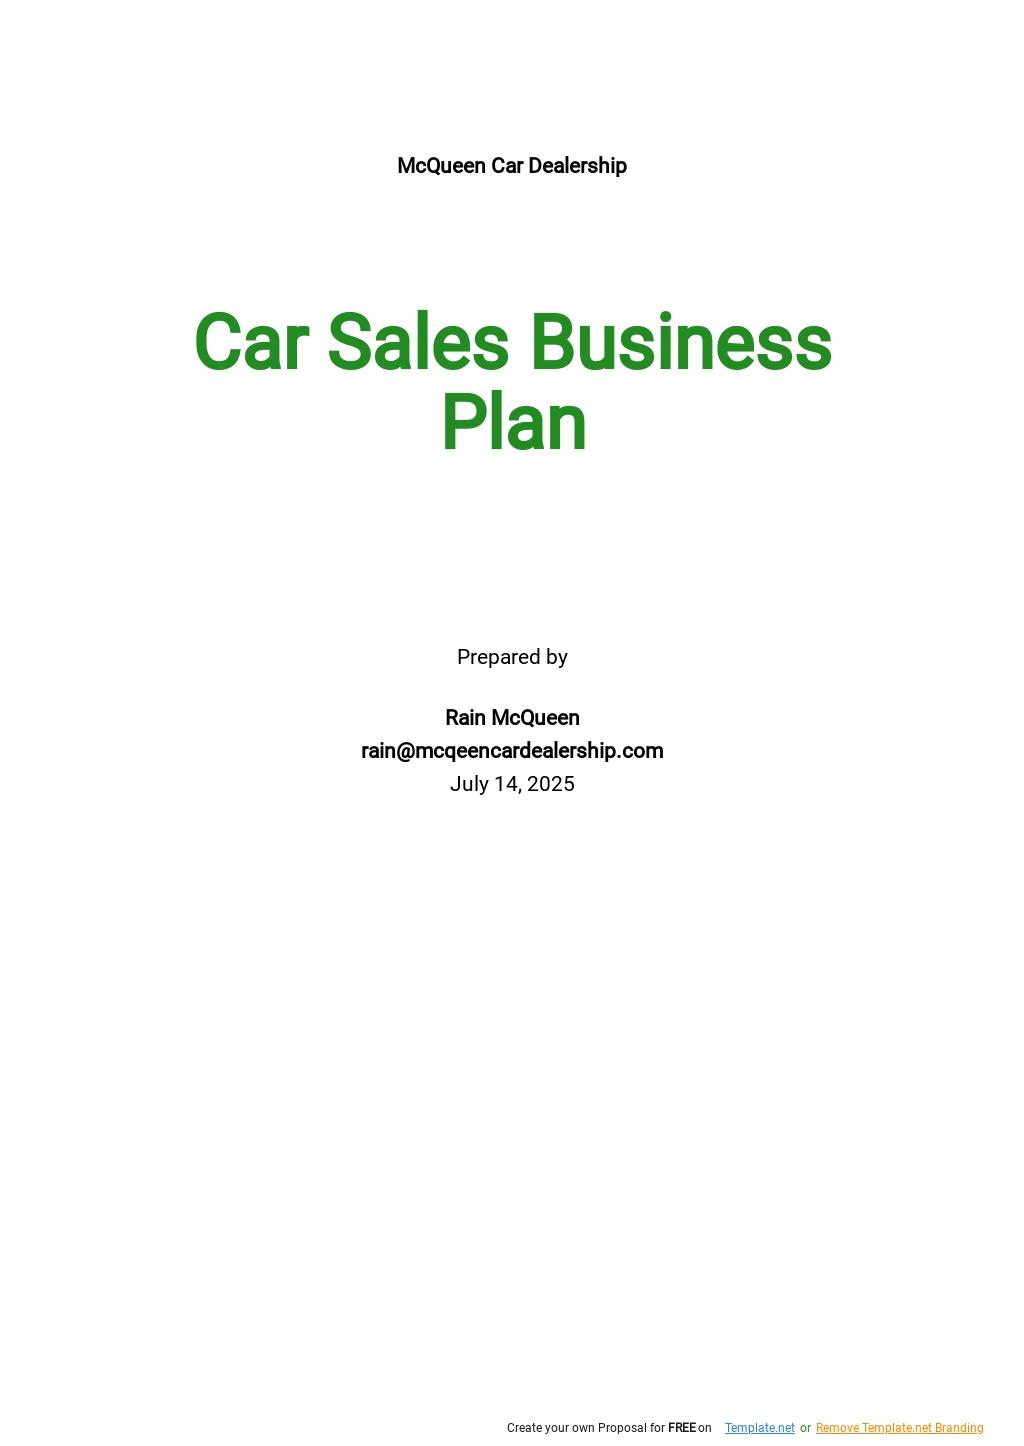 Car Sales Business Plan Template.jpe